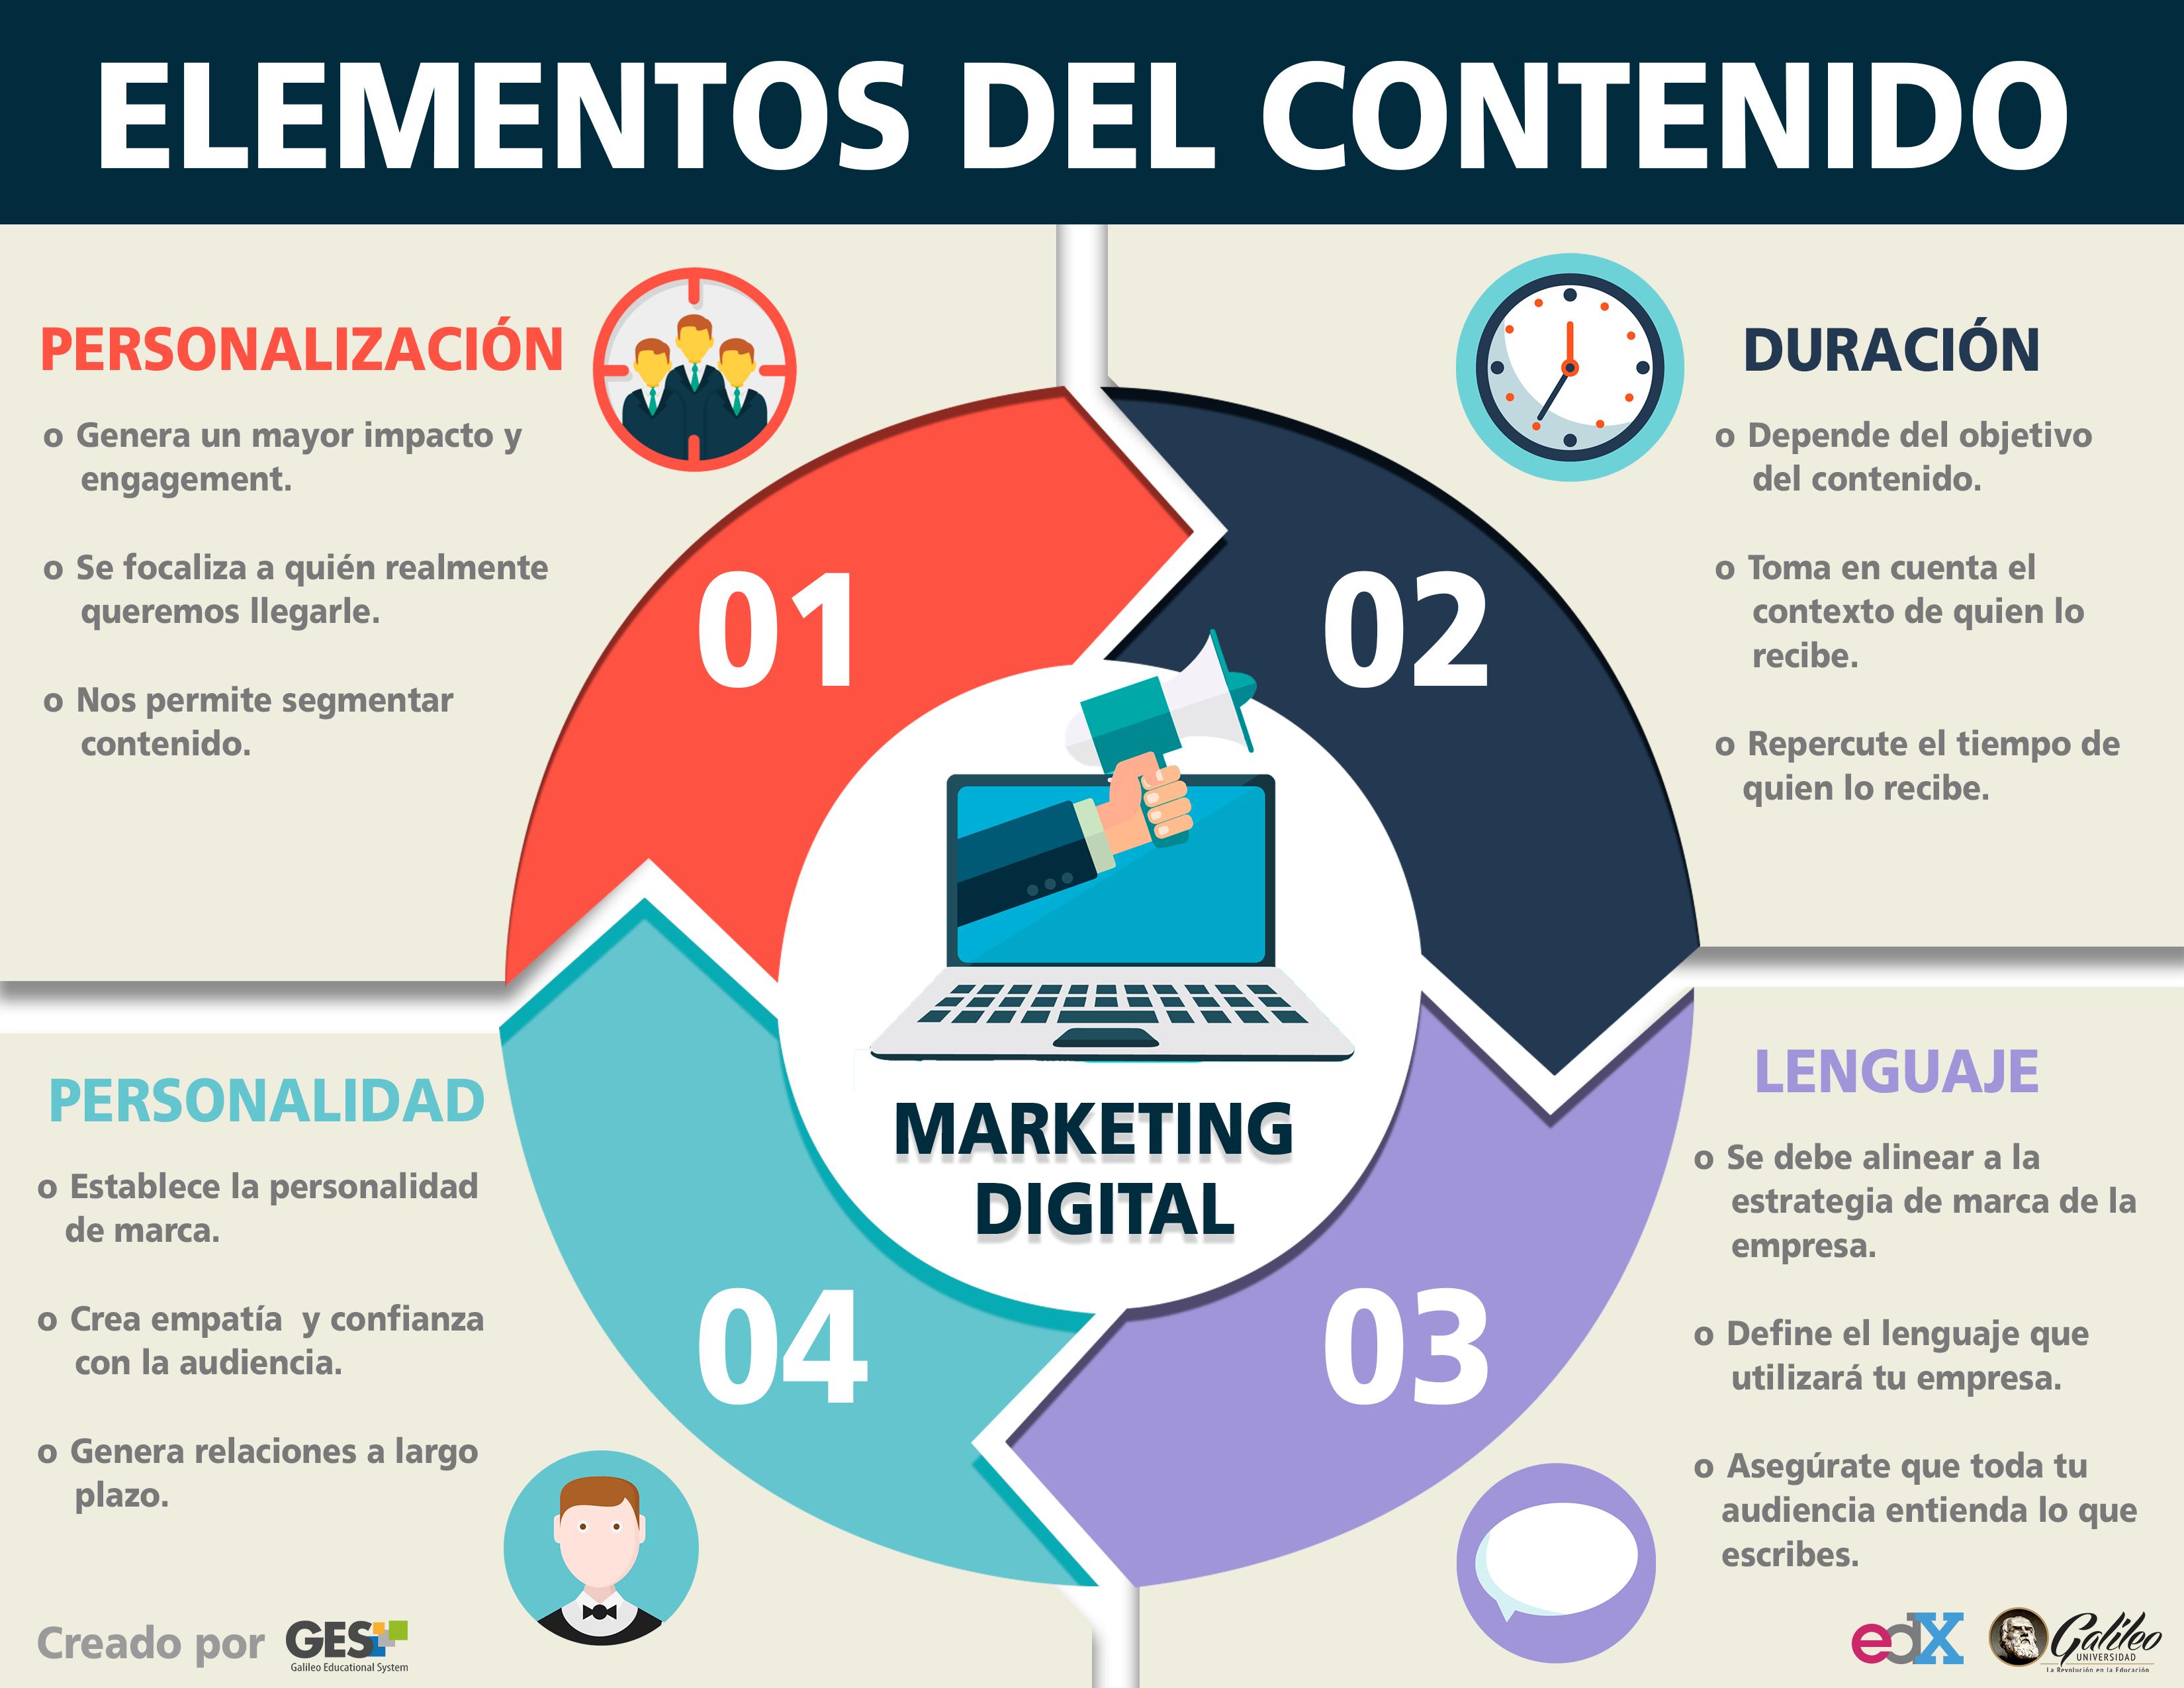 Conceptualizando Elementos Del Contenido Material Del Curso Pcpmk01x Edx In 2020 Chart Social Media Pie Chart